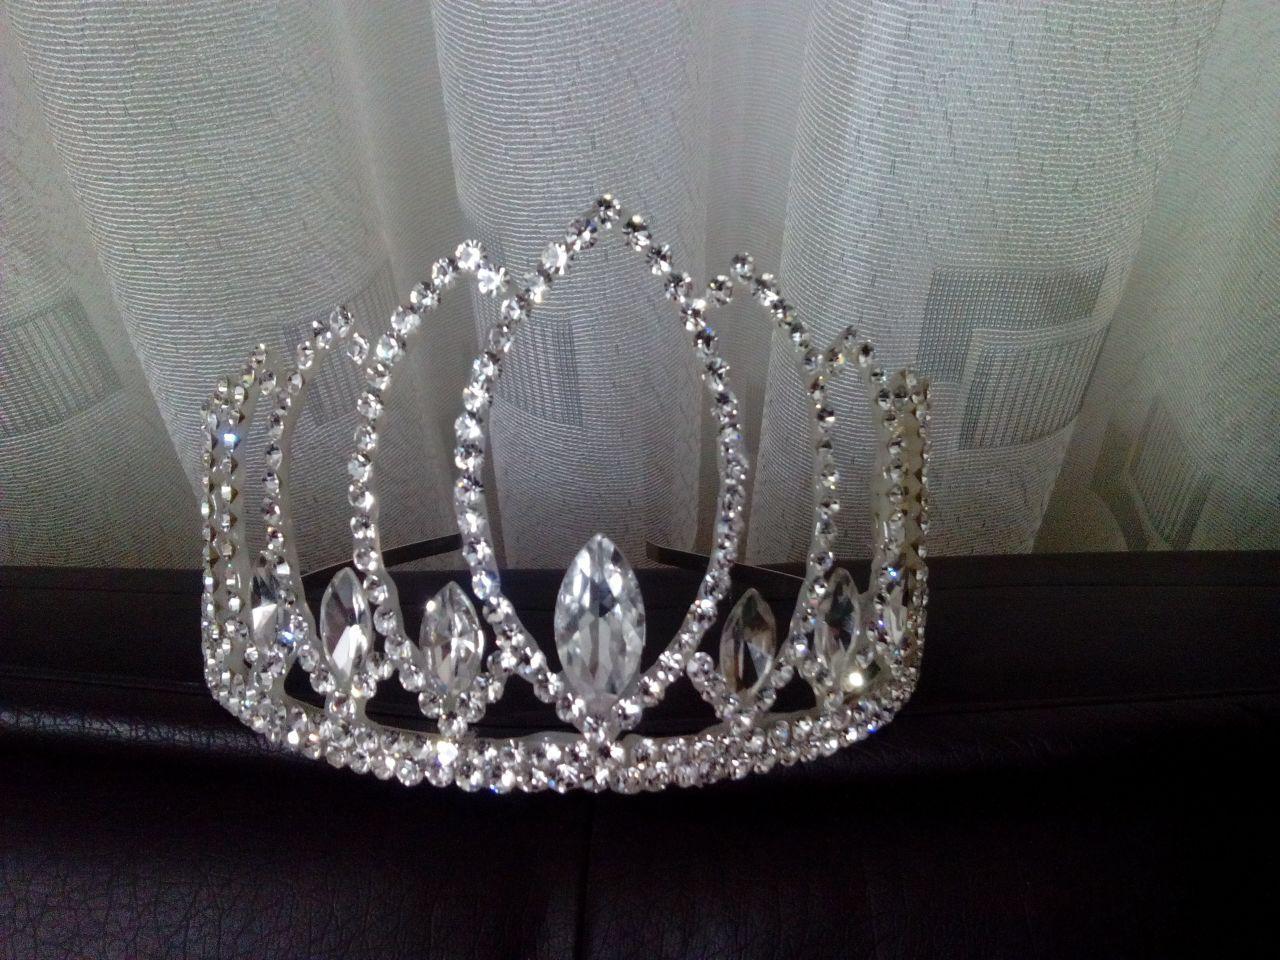 lemoo-1-Crown-Jelly-beautiful-1